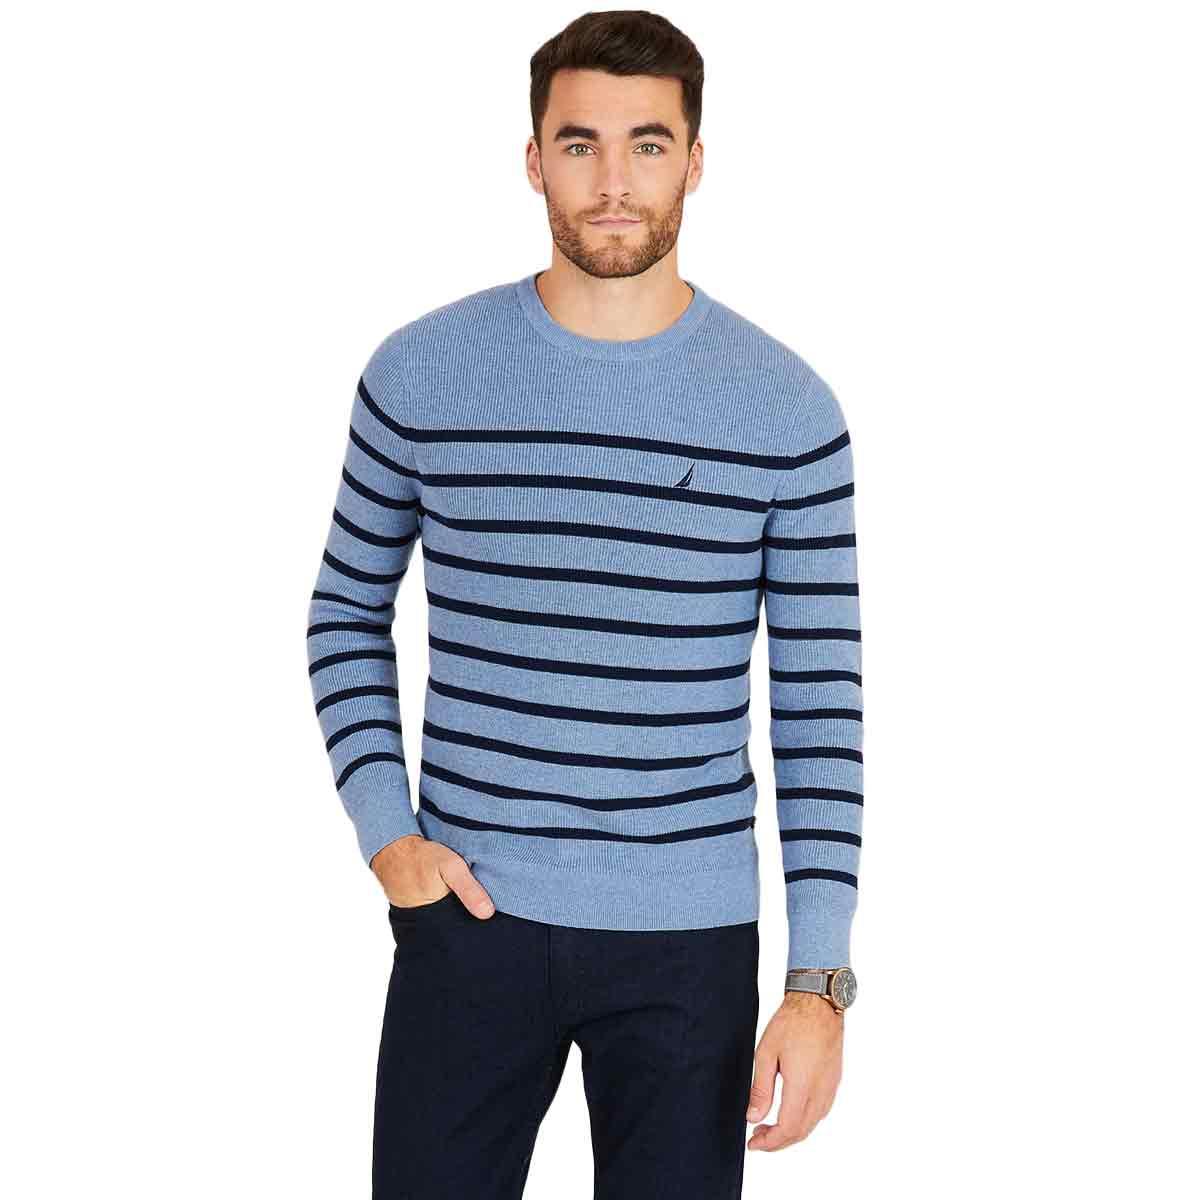 Nautica Men's Navtech Breton Stripe Crewneck Sweater - Blue, XXL